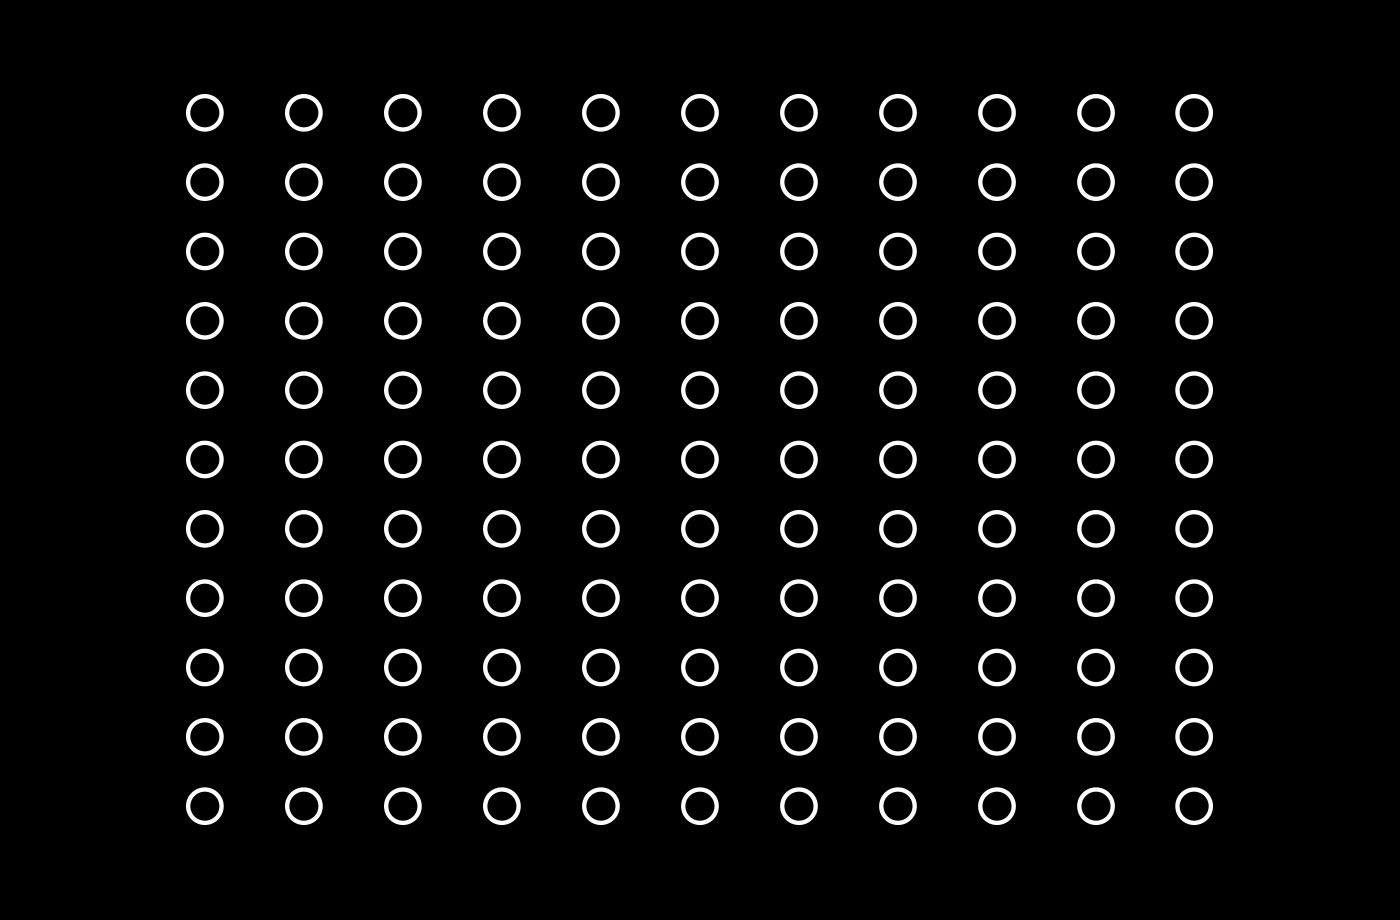 ivan-montijano-circle-00